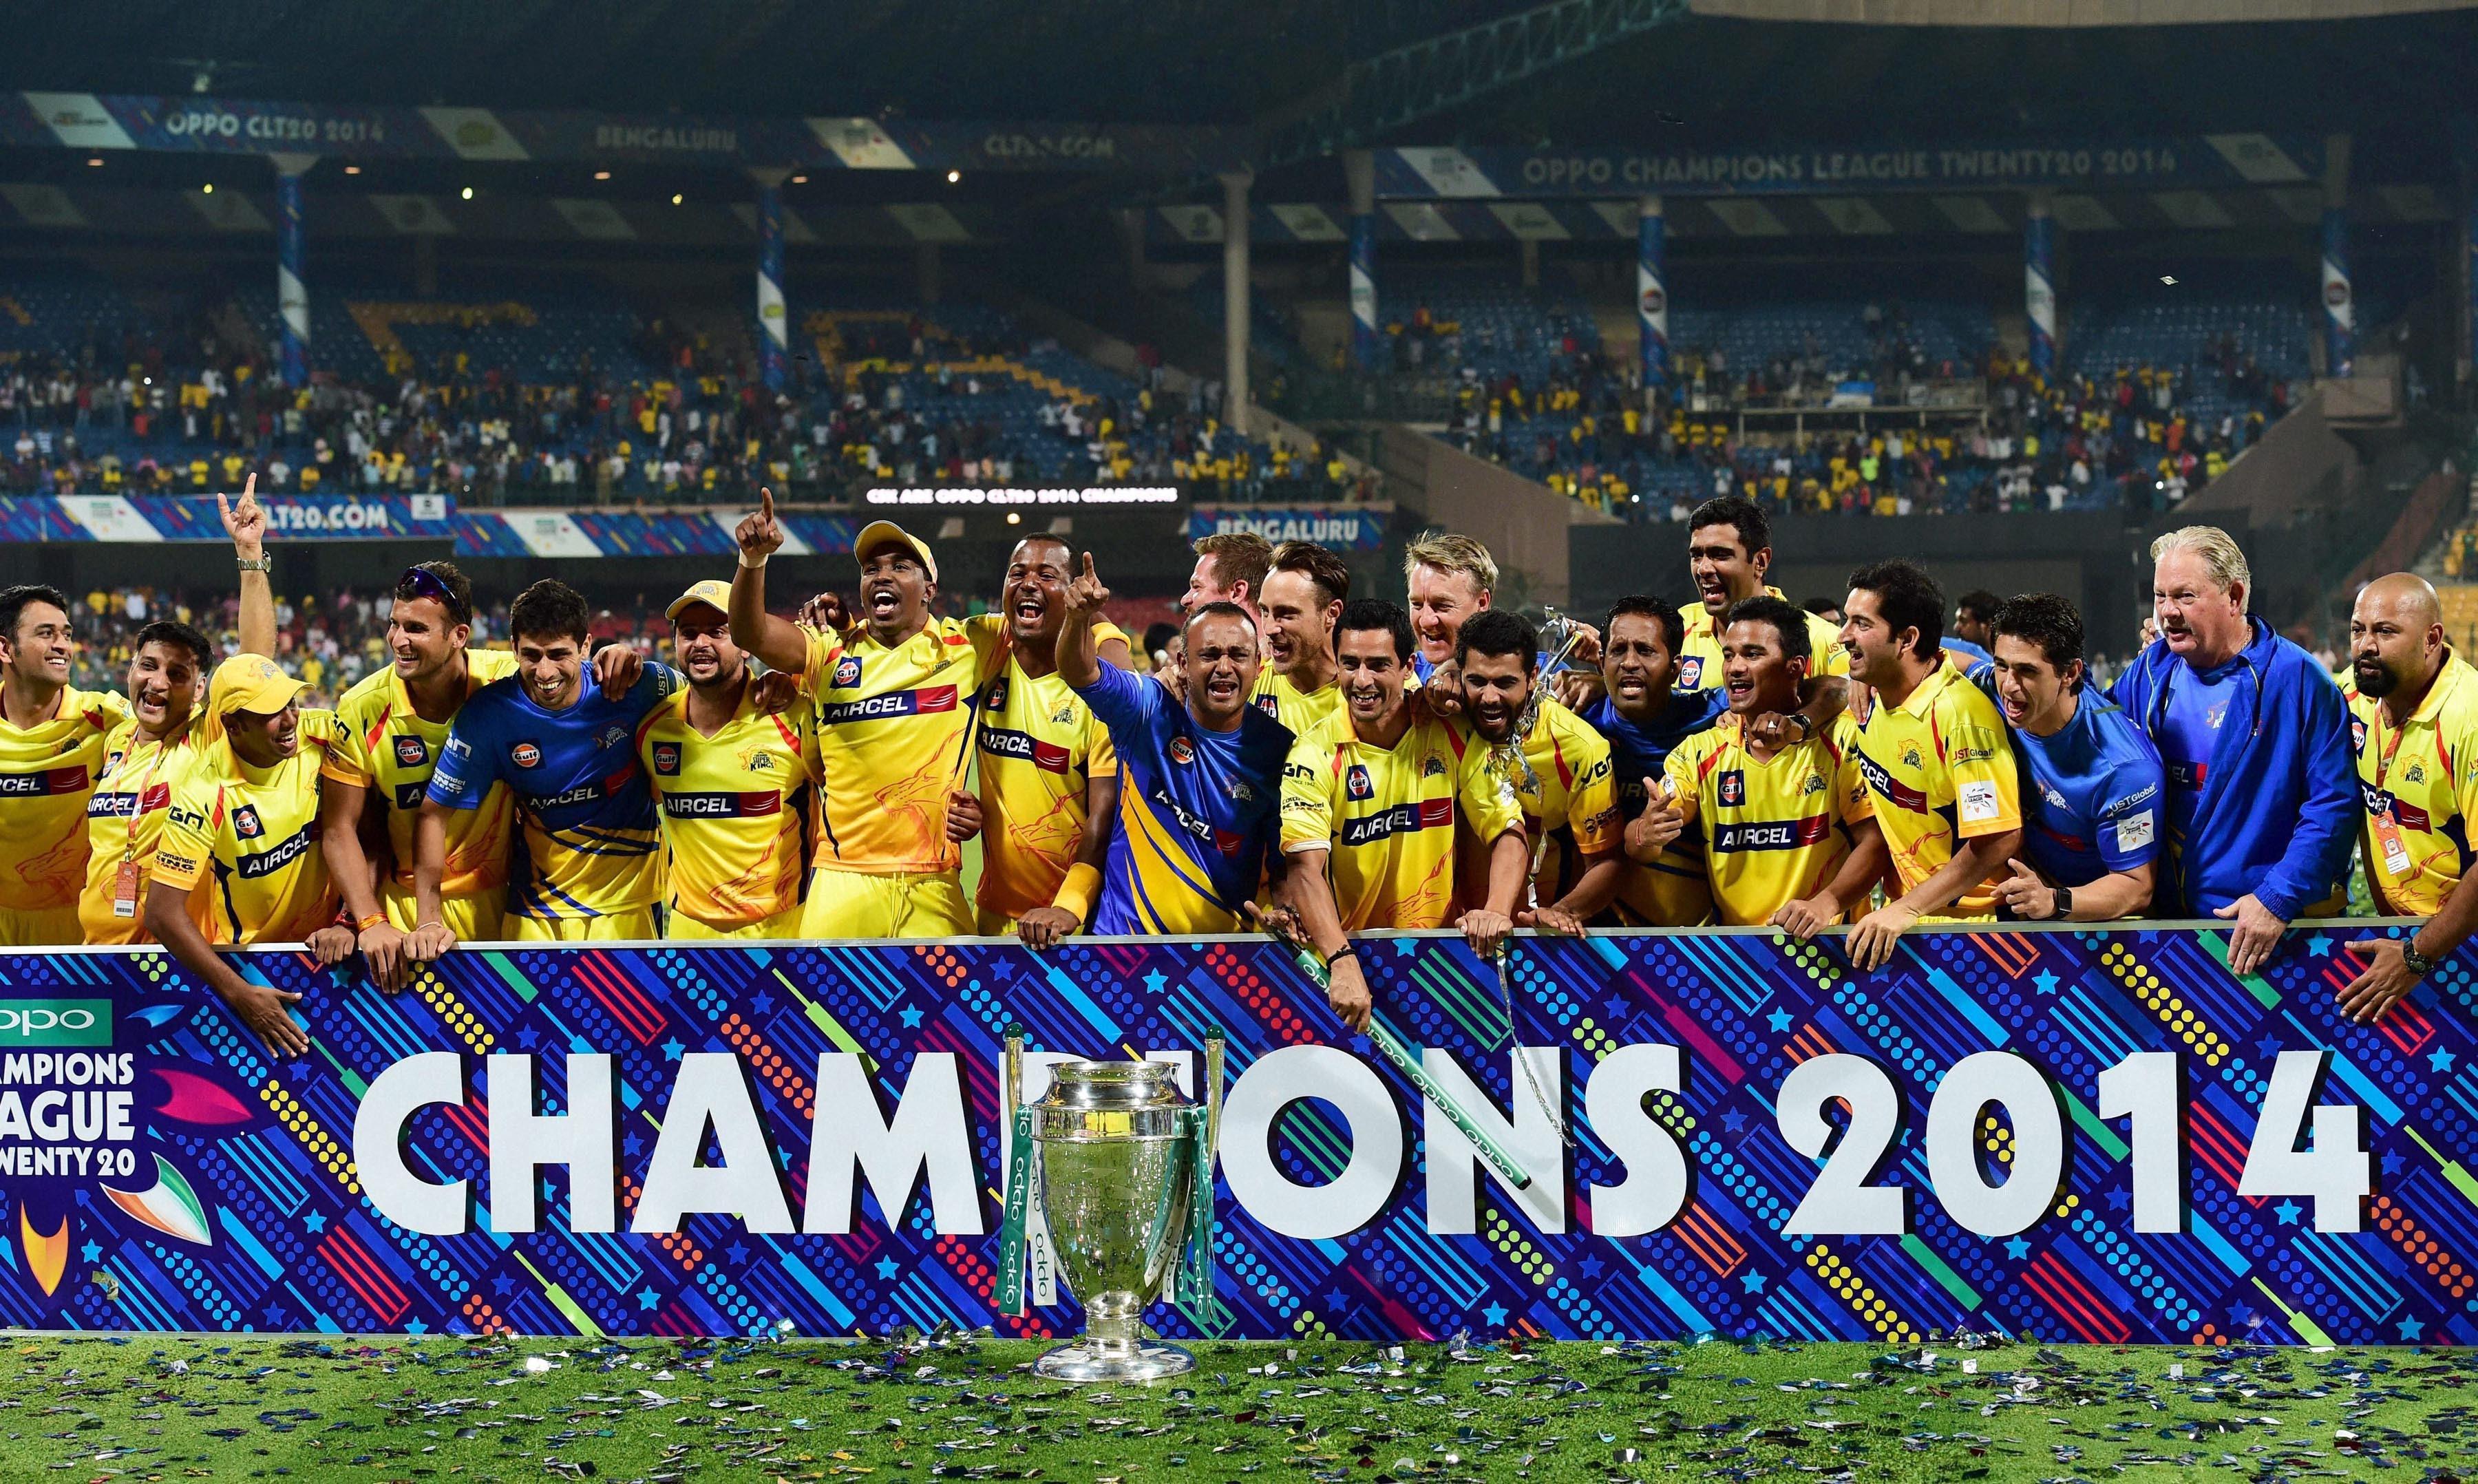 Reports Bcci Set To Abandon Champions League T20